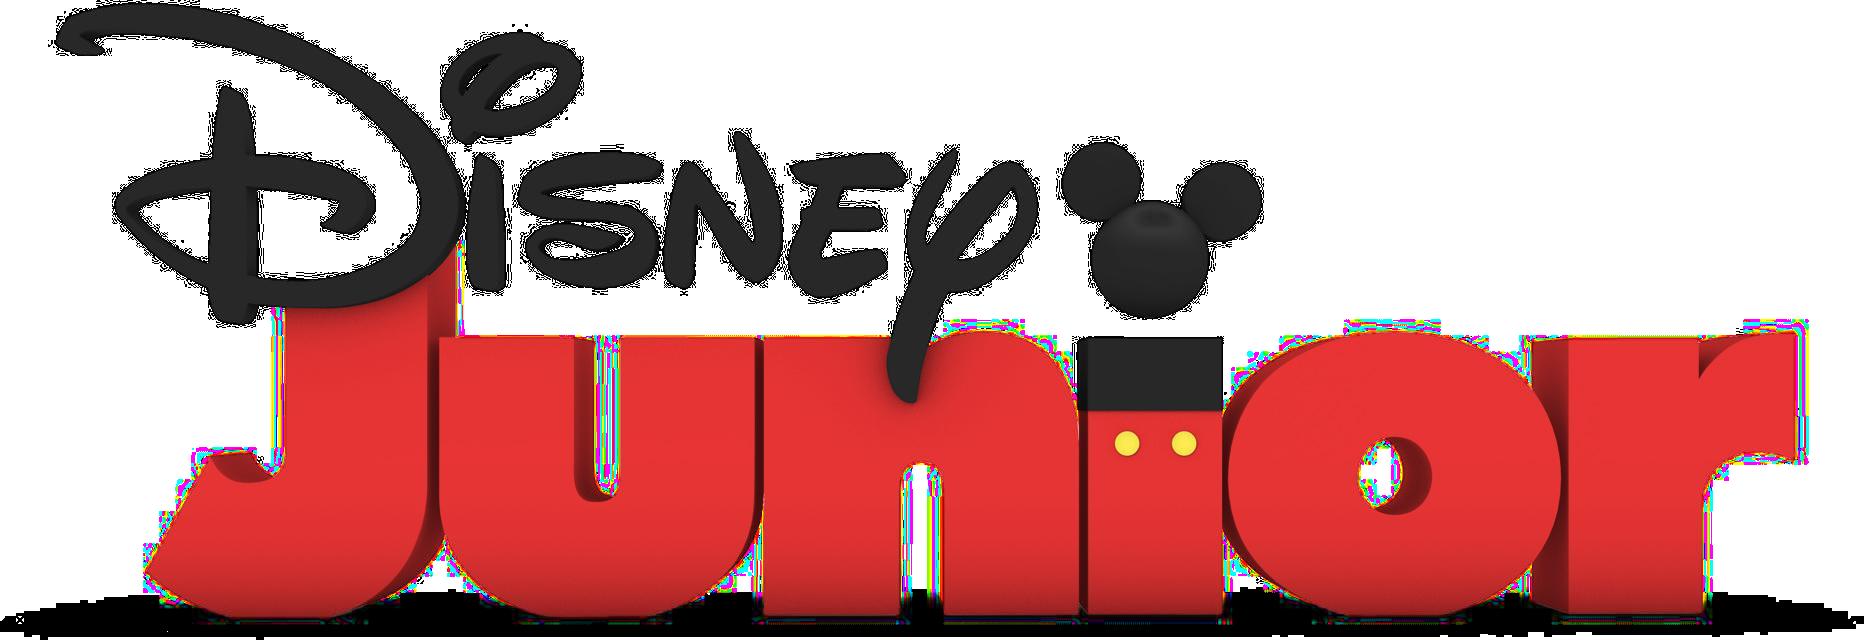 Disney Channel Original Logo 2007